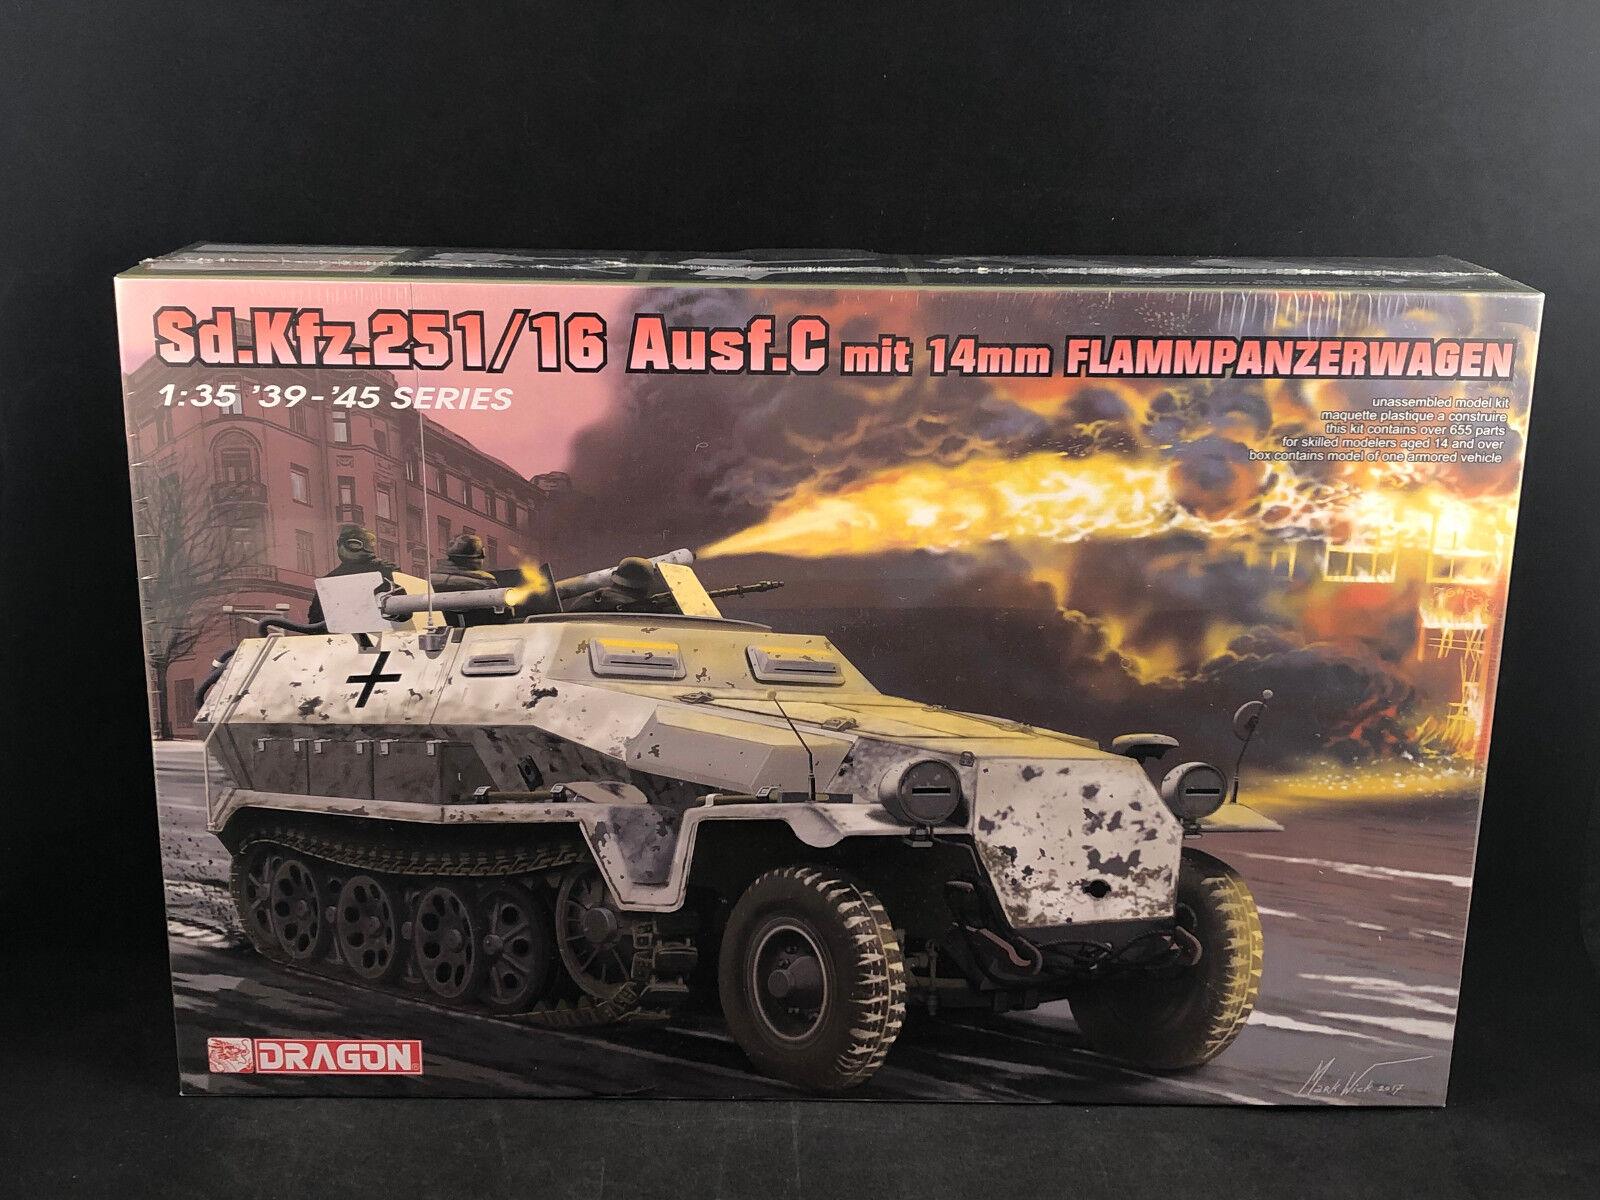 Dragon Sd.Kfz.251 16 Ausf.C mit 14mm Flammpanzerwagen 1 35 Scale Model Kit 6864